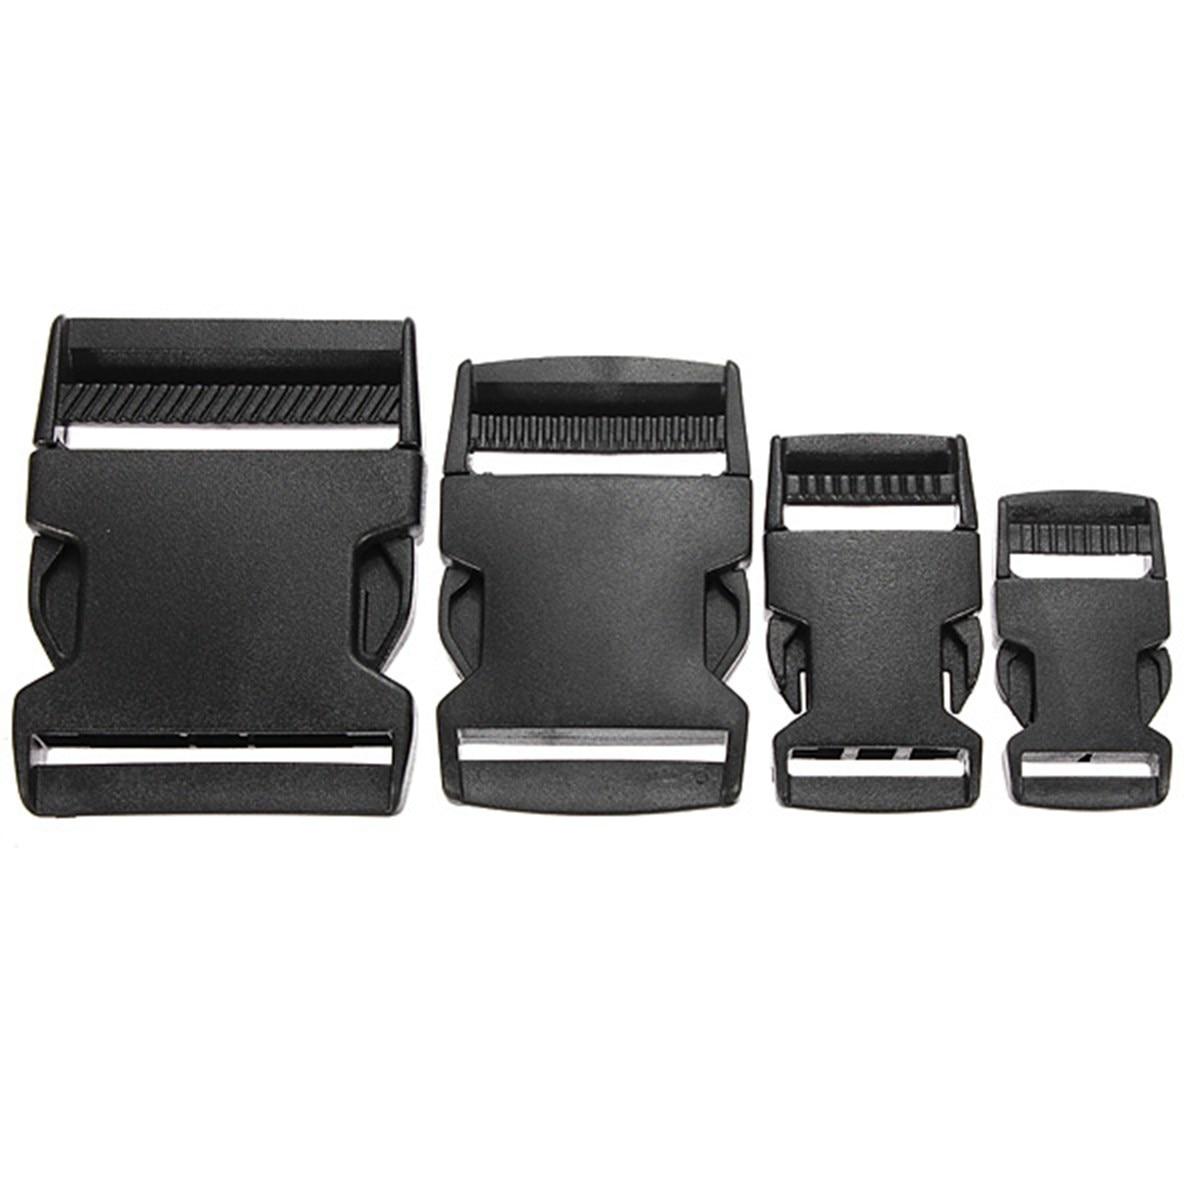 цена на Osmond 1PCS 25/40/50mm Black Plastic Side Quick Release Clasp Buckles Webbing Strap Useful Bag Accessories Parts For Wholesale